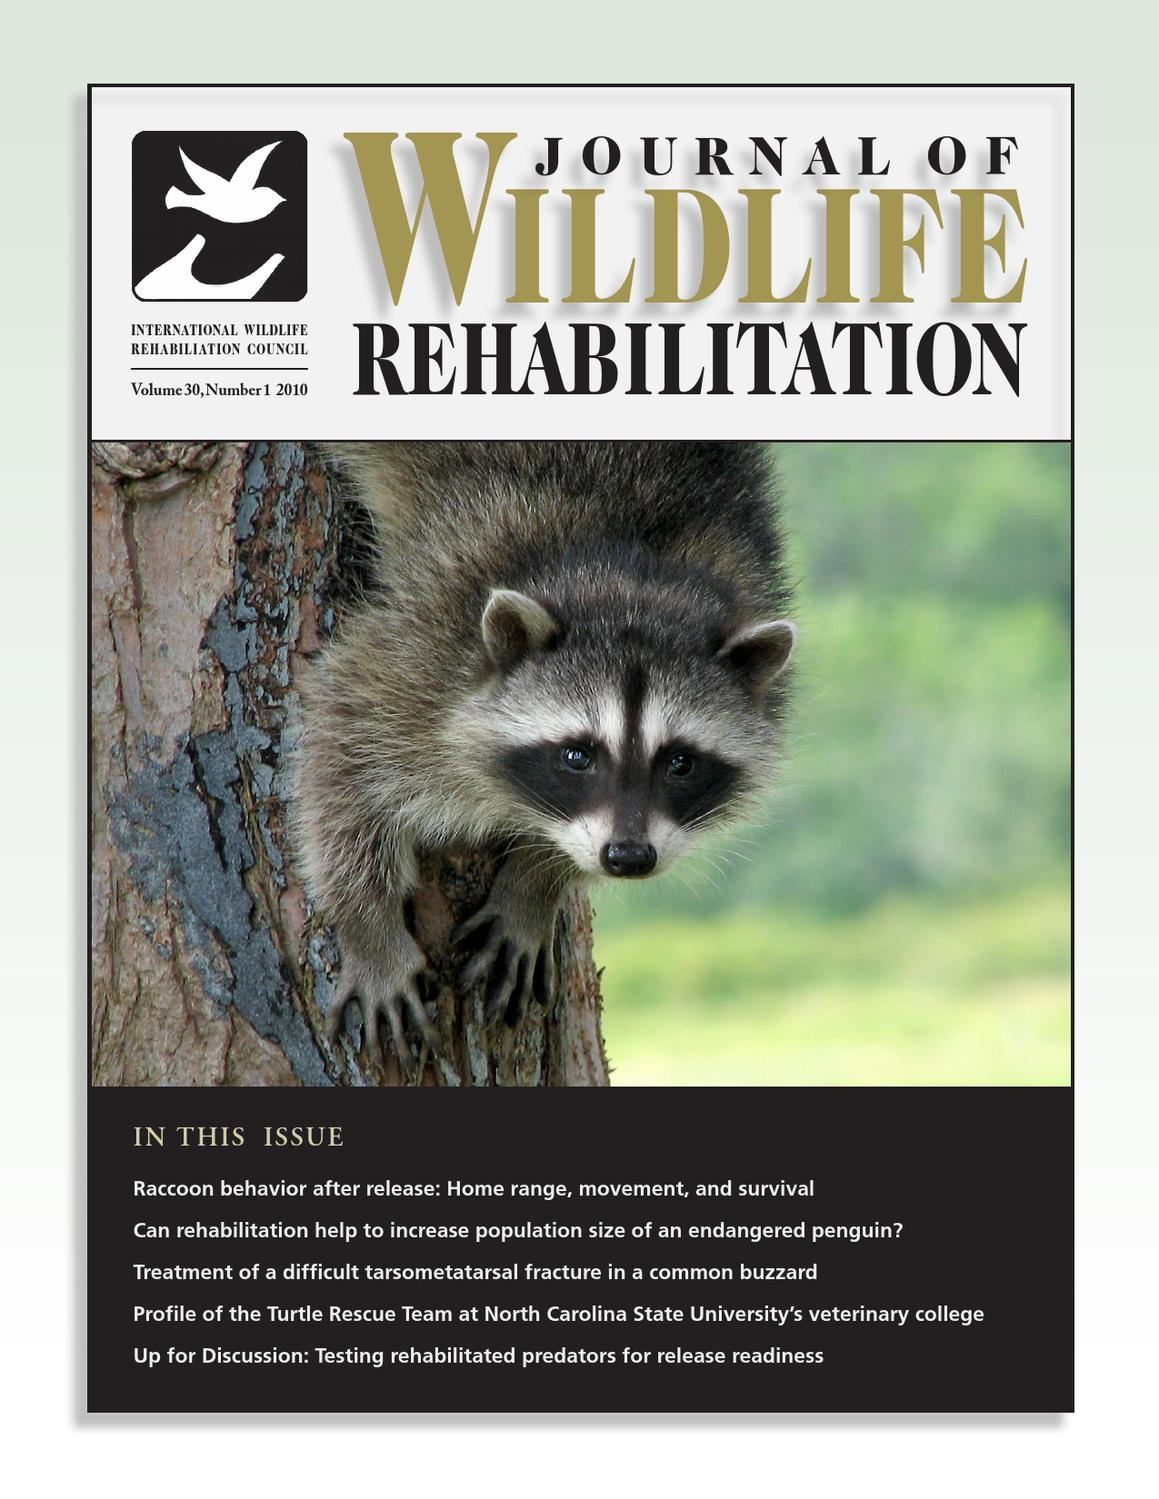 JWR Volume 30 Issue 1 by The International Wildlife